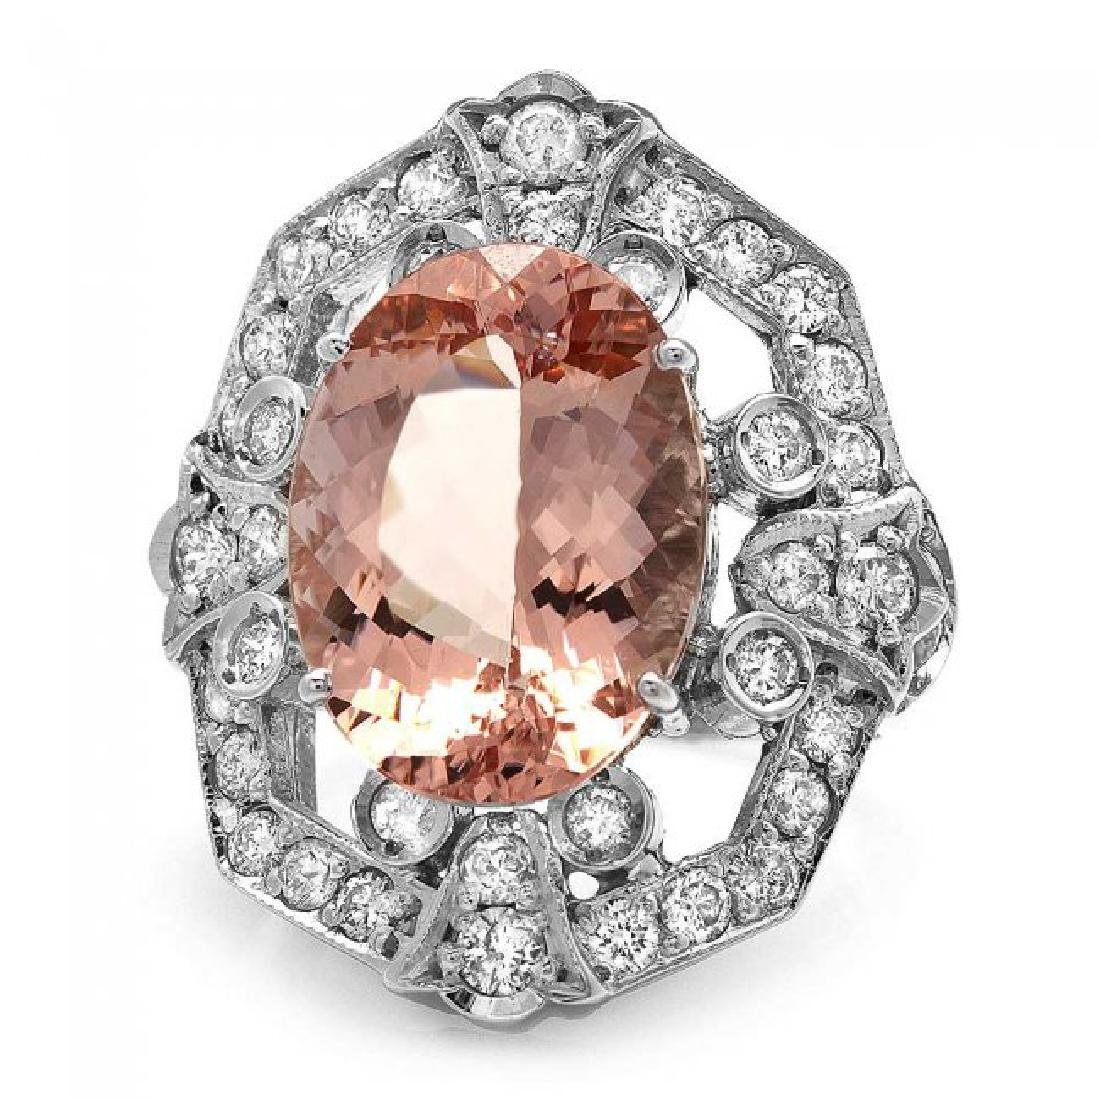 14k Gold 7.50ct Morganite 1.35ct Diamond Ring - 2